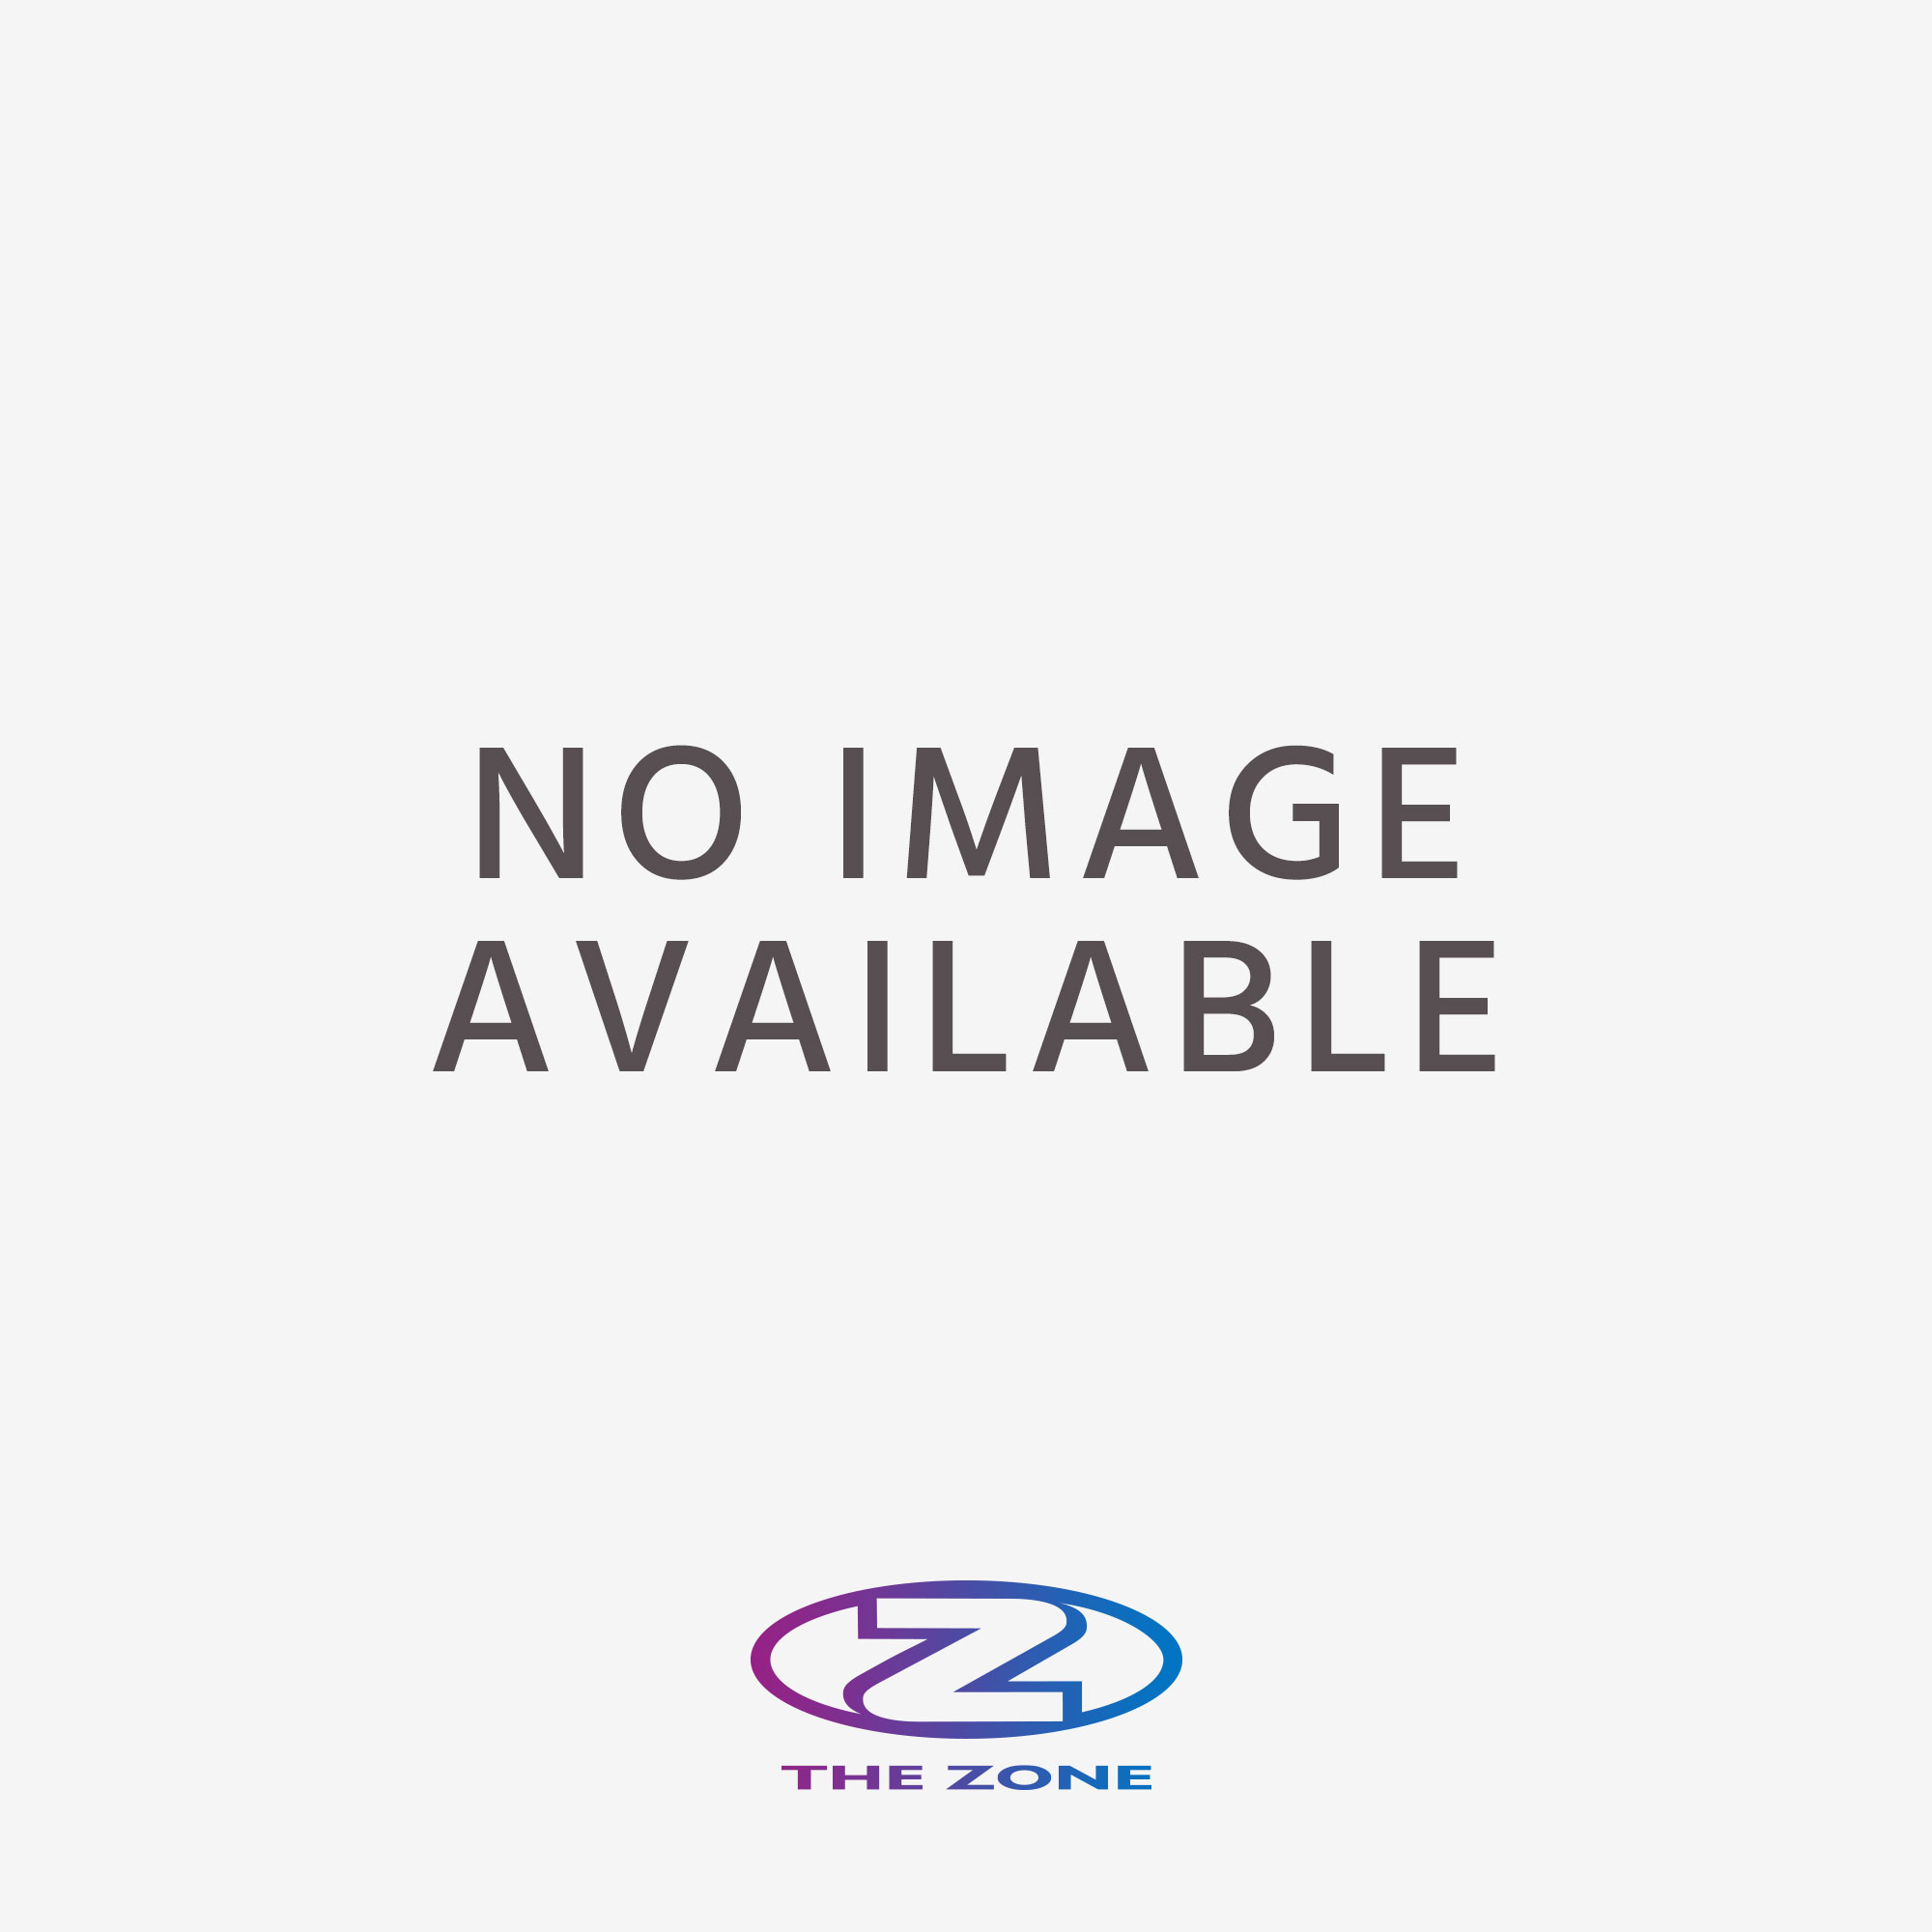 b987bff78892f8 Rebel Girls' Super Shiny Gymnastics Leotard |The Zone (Z2139REB)